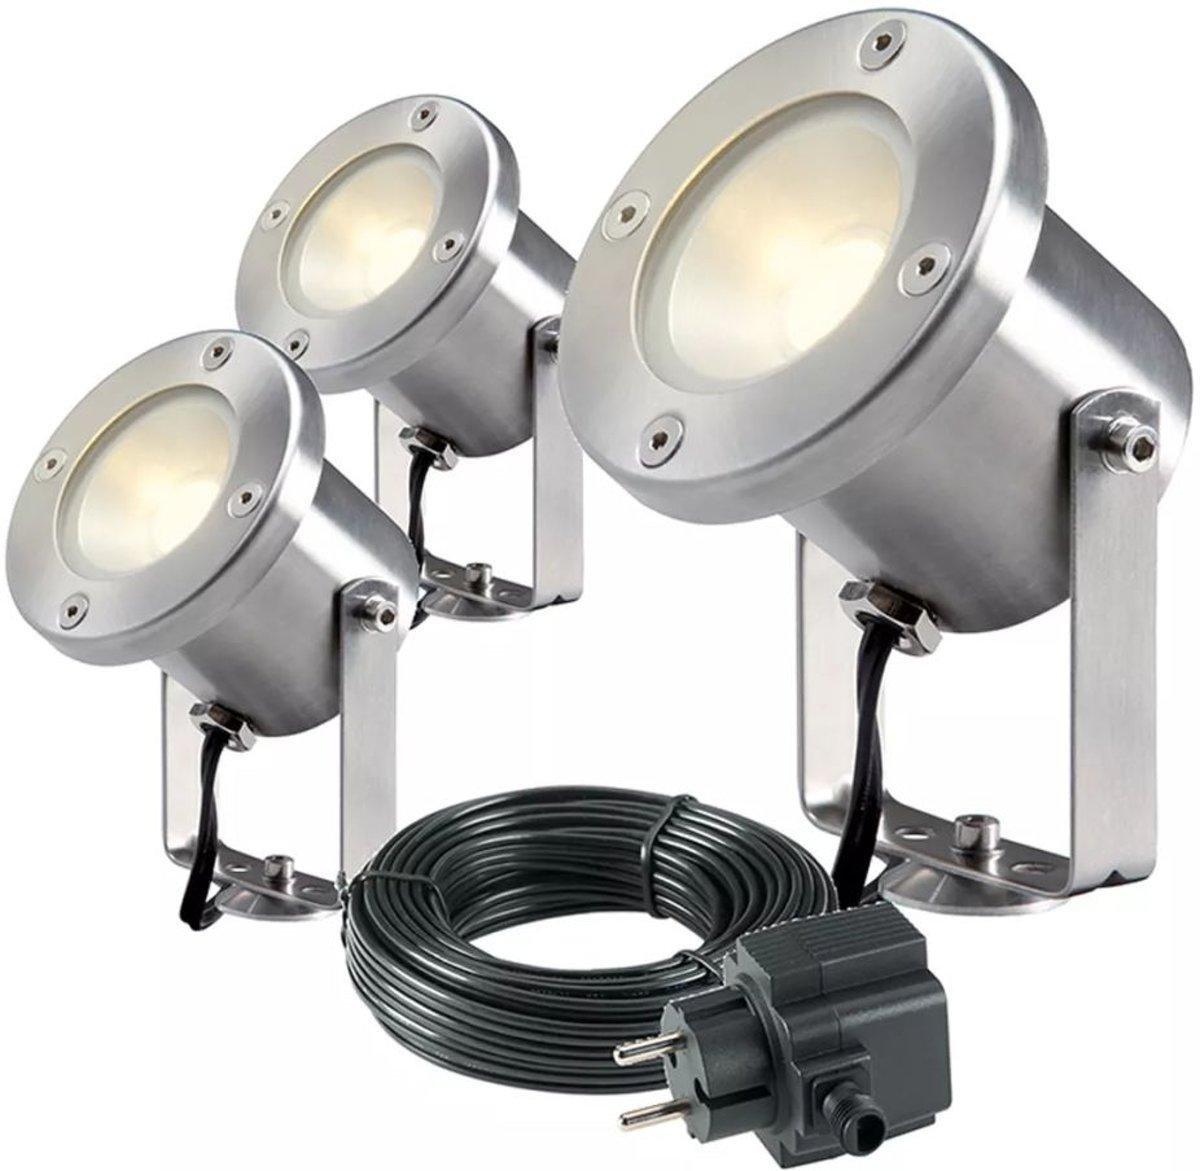 Garden Lights LED-spotlight Catalpa RVS 3 stuks 4121603 kopen